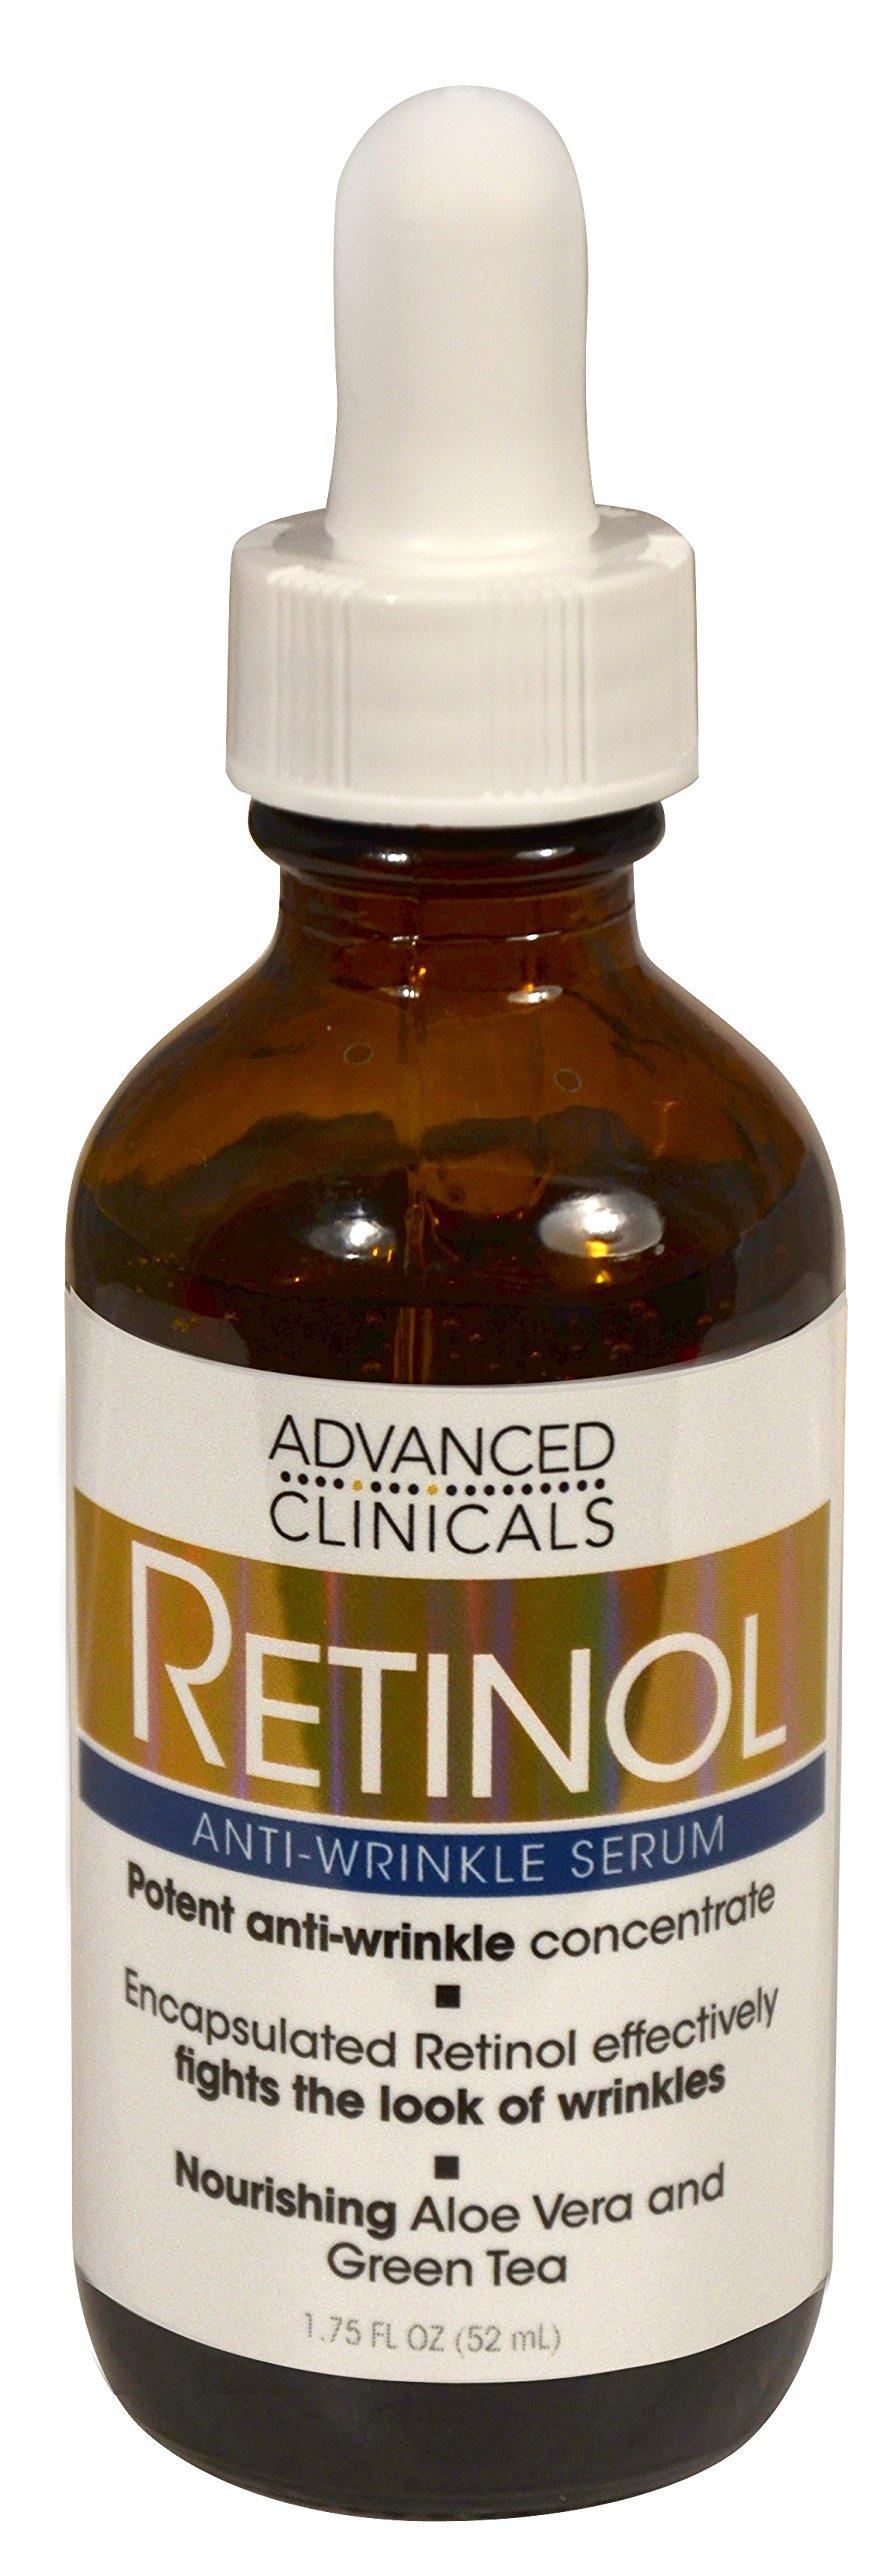 Advanced Clinicals Professional Strength Retinol Serum. Anti-aging, Wrinkle Reducing 1.75 Fl Oz.